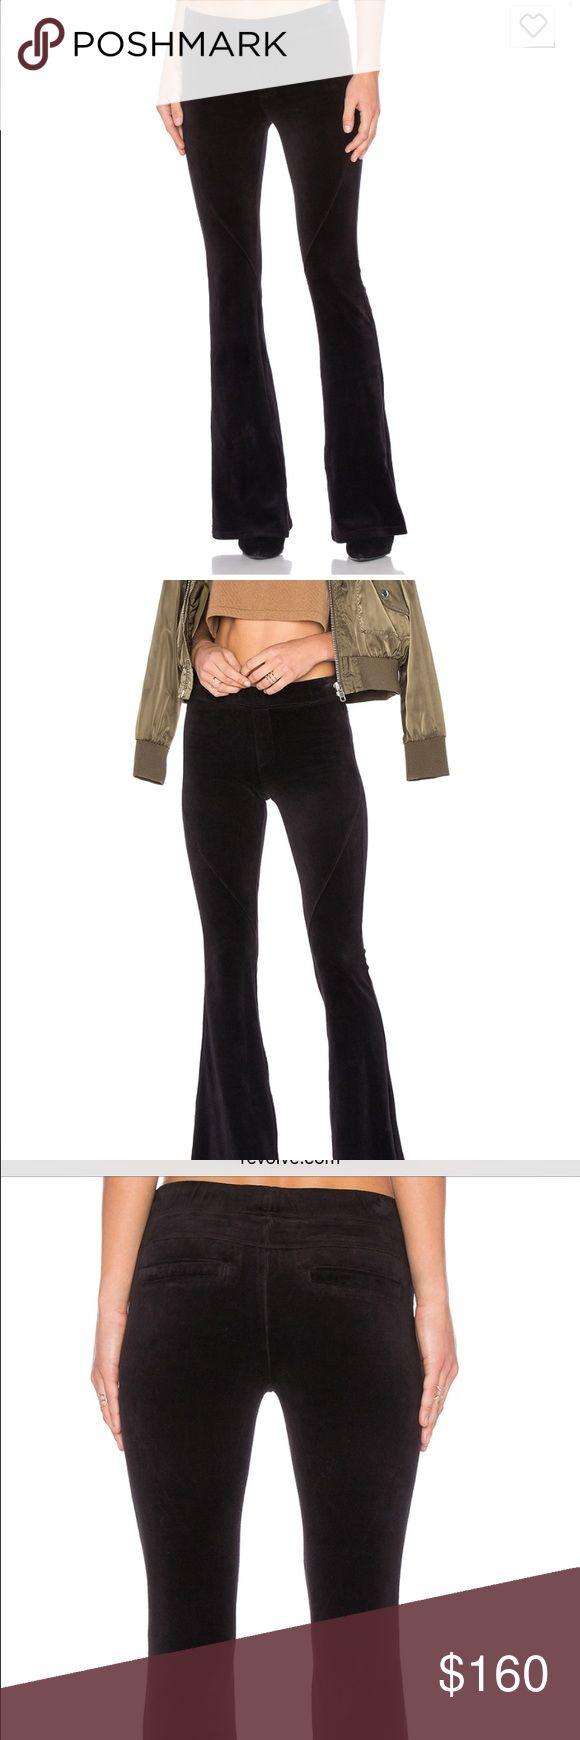 Pam & Gela XS Velour Pant $165 Black XS slim Boot/Bell Flare Leg Velour Pant NWT $165 Black/Grey pam & gela Pants Boot Cut & Flare